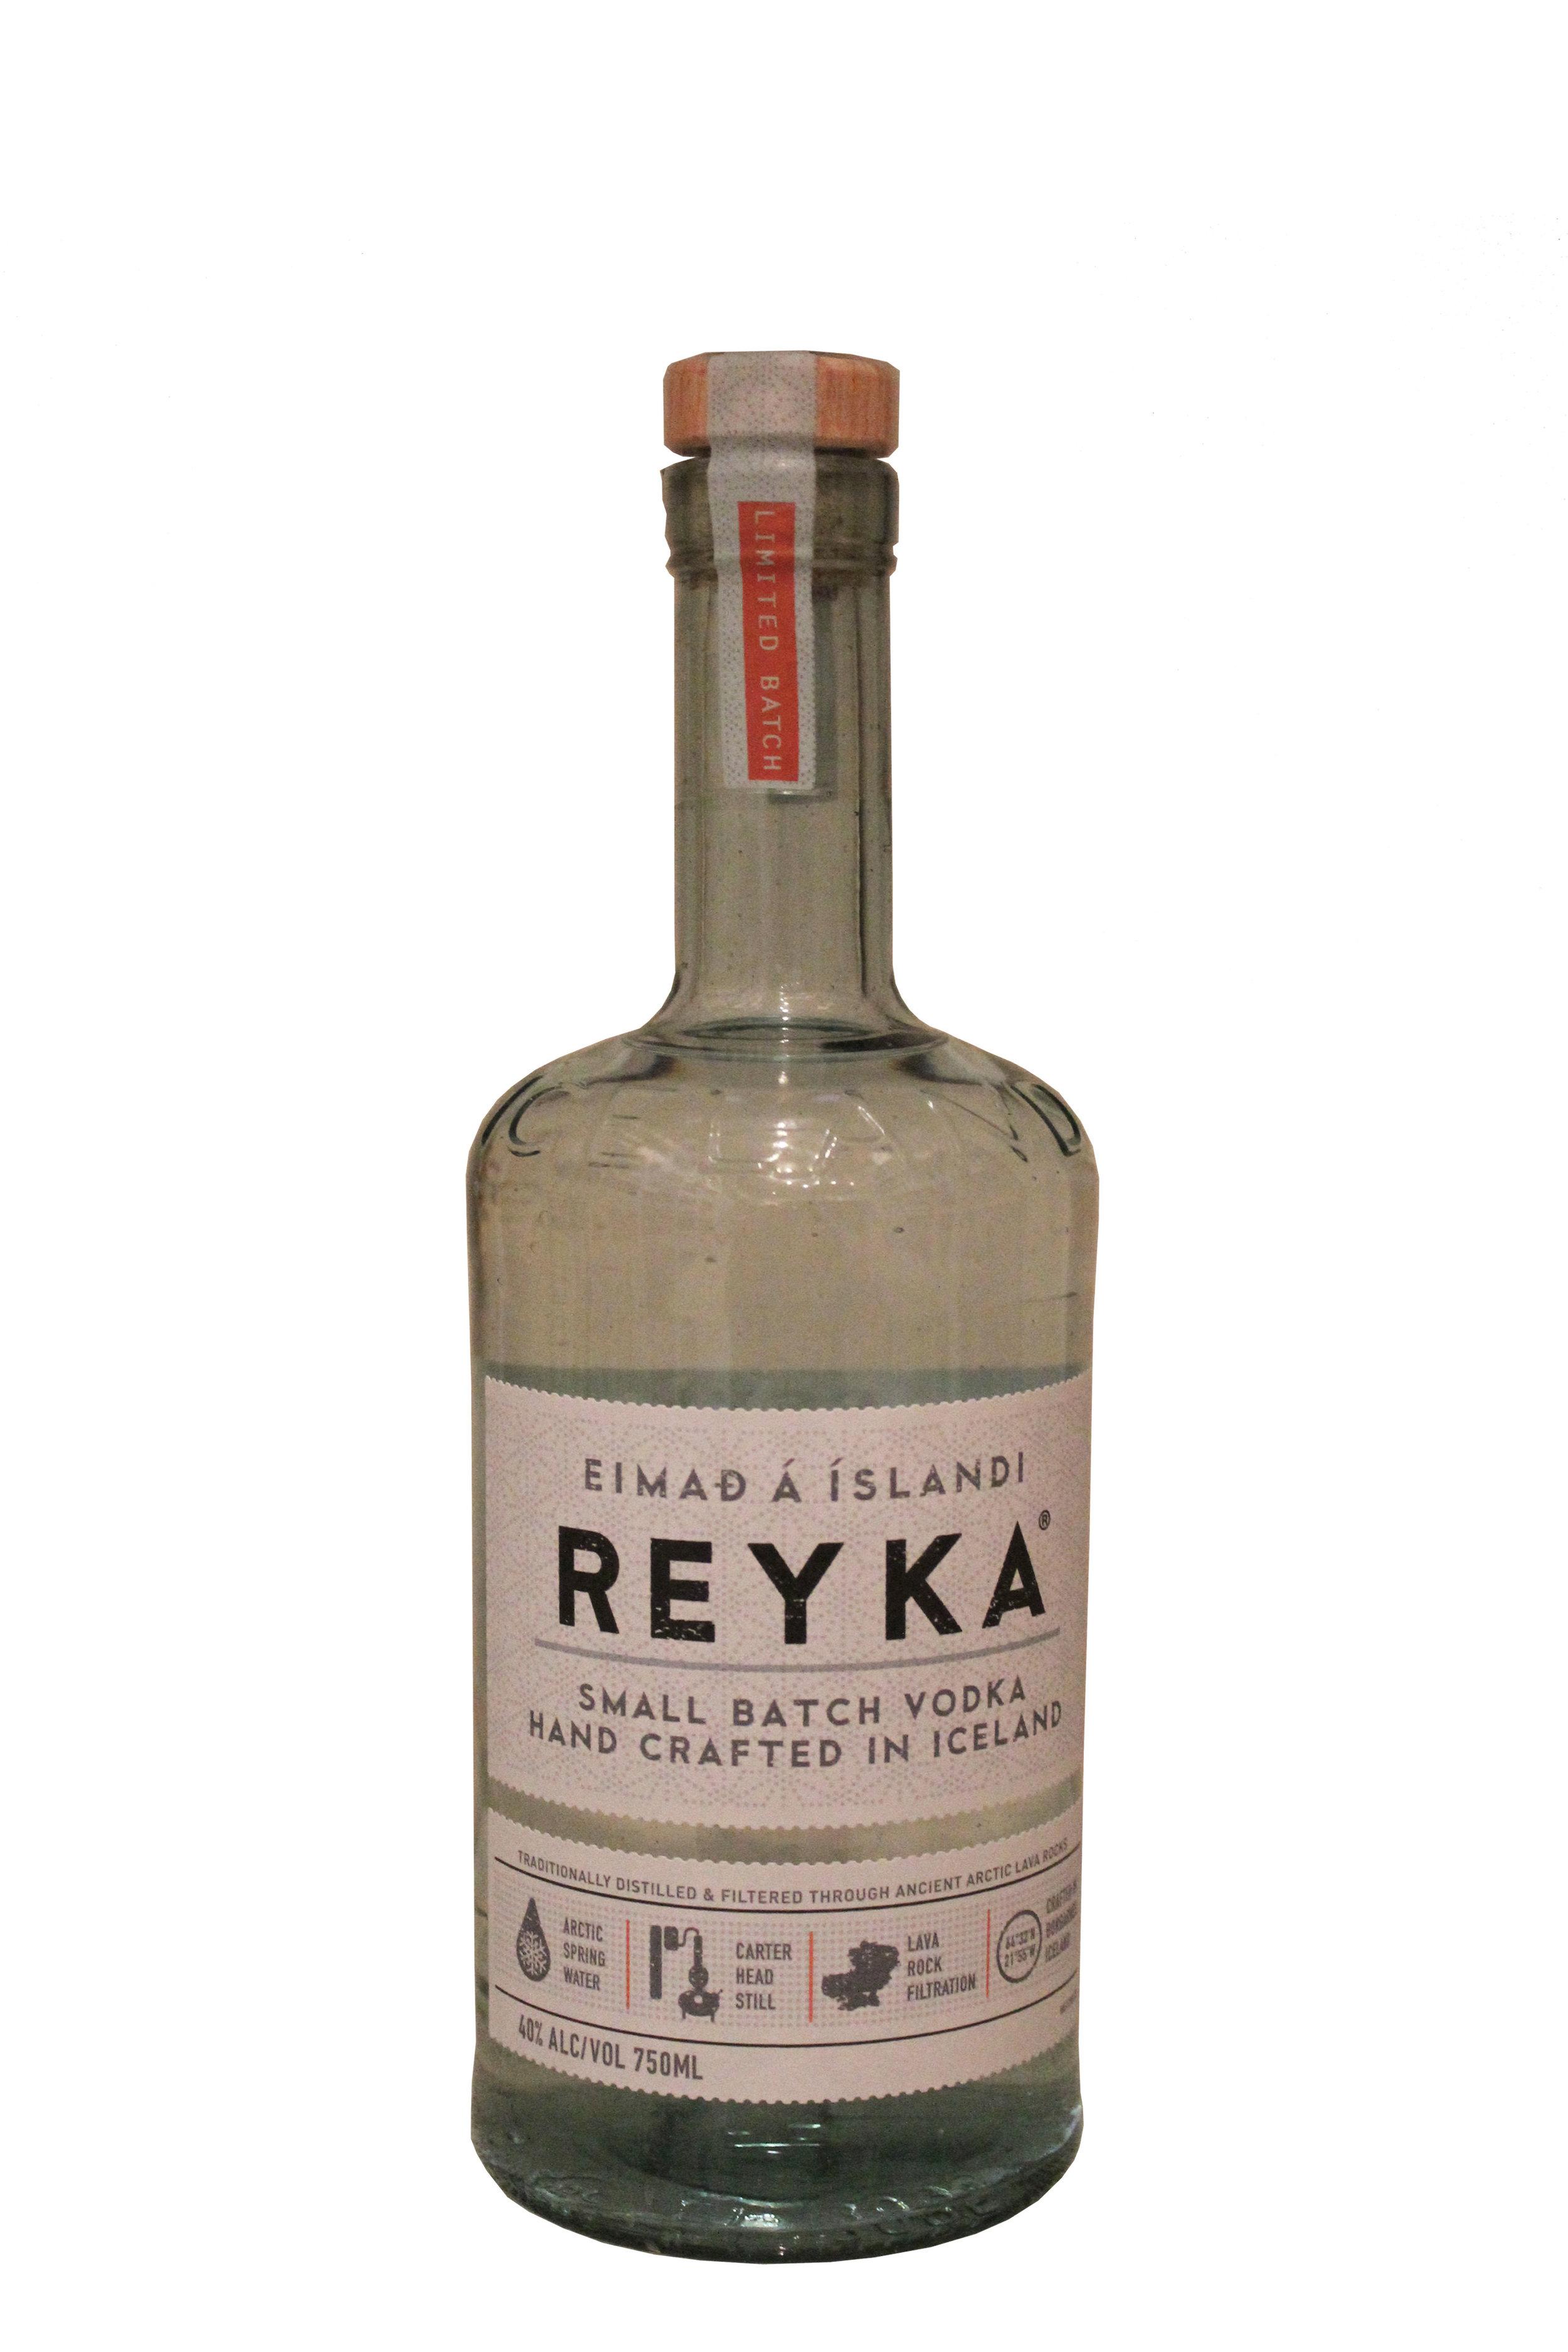 Small-Batch Handcrafted Vodka  Reyka, Iceland